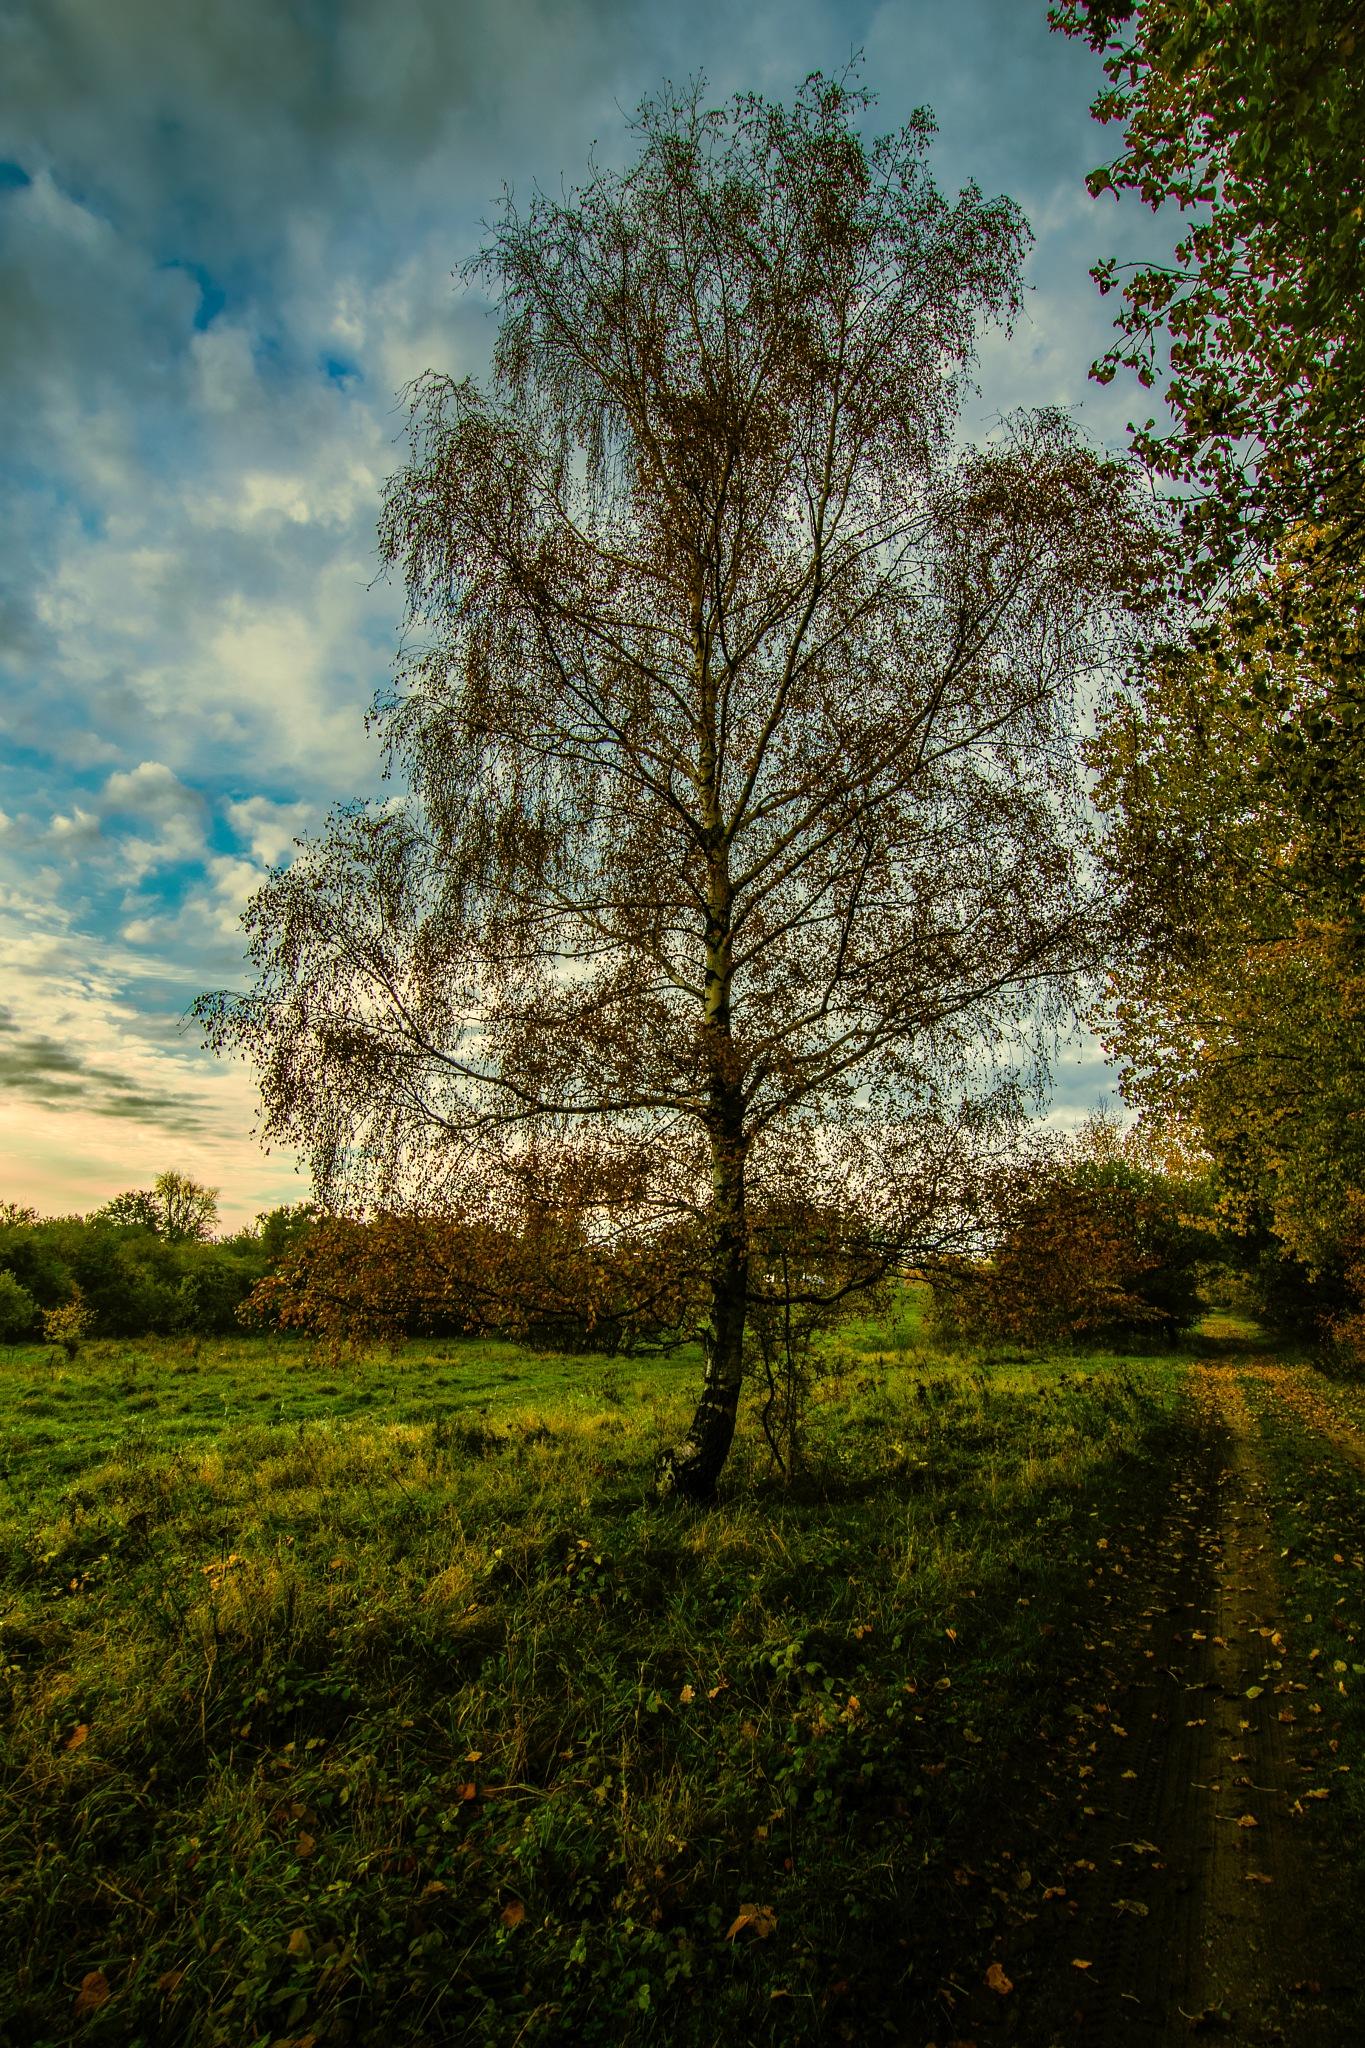 The birch by Michael B. Rasmussen